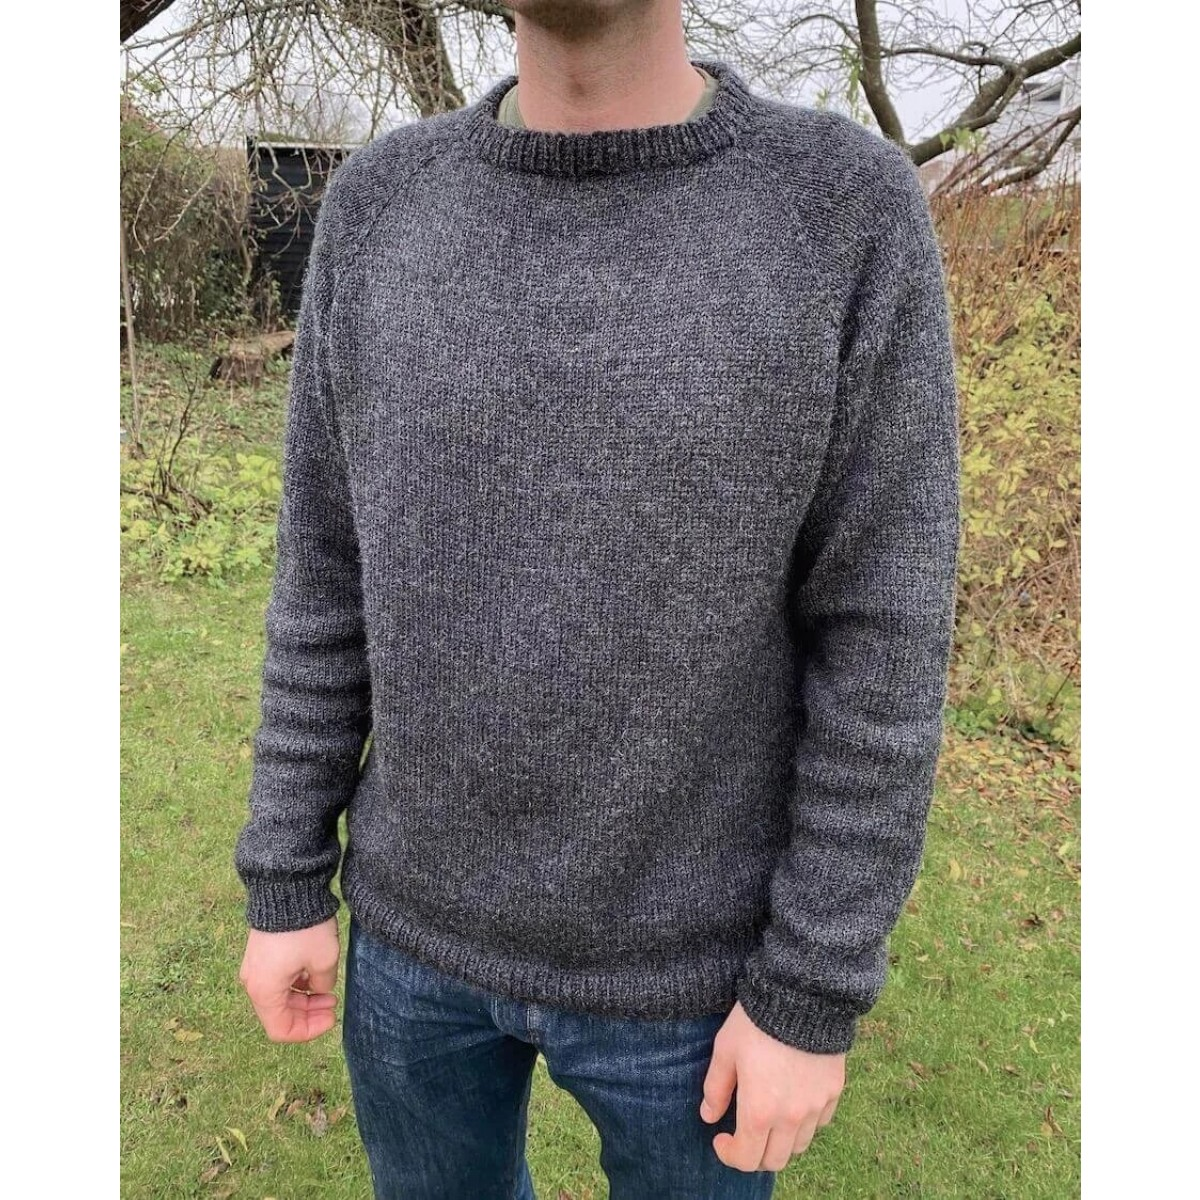 Hansholm sweater